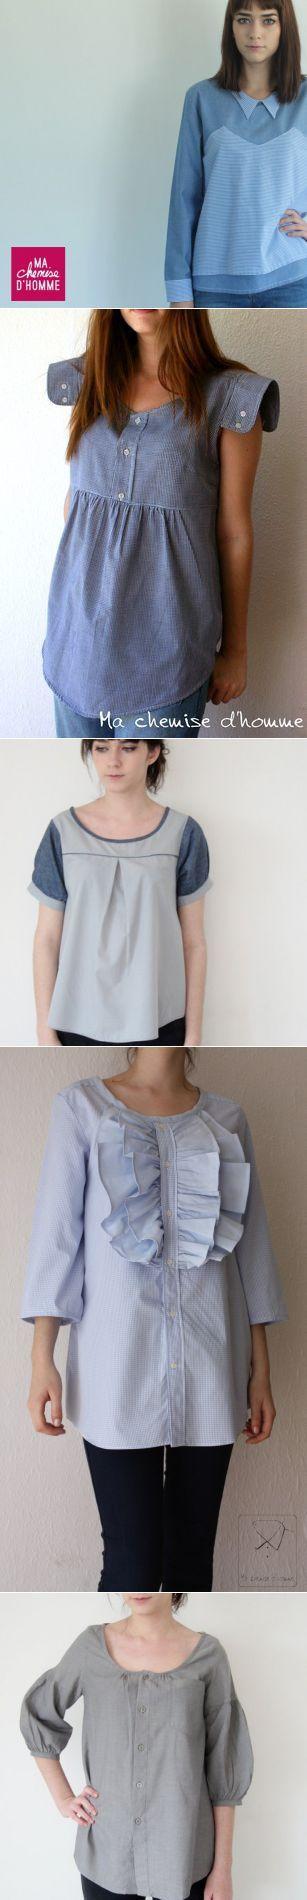 Переделка рубашек (большой трафик) / Рубашки /